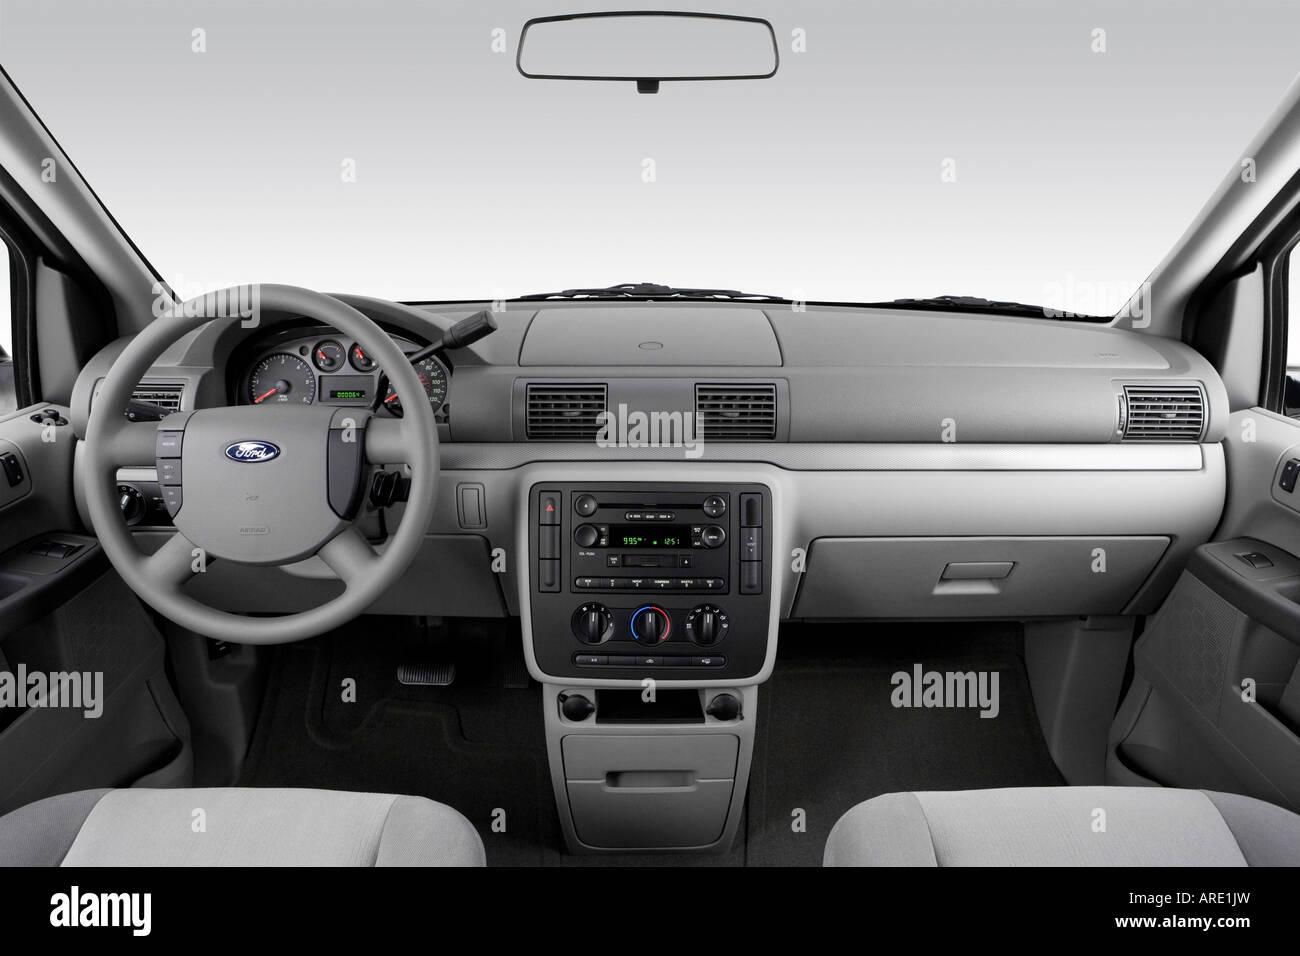 Ford Freestar SE In Red Dashboard Center Console Gear - 2006 freestar